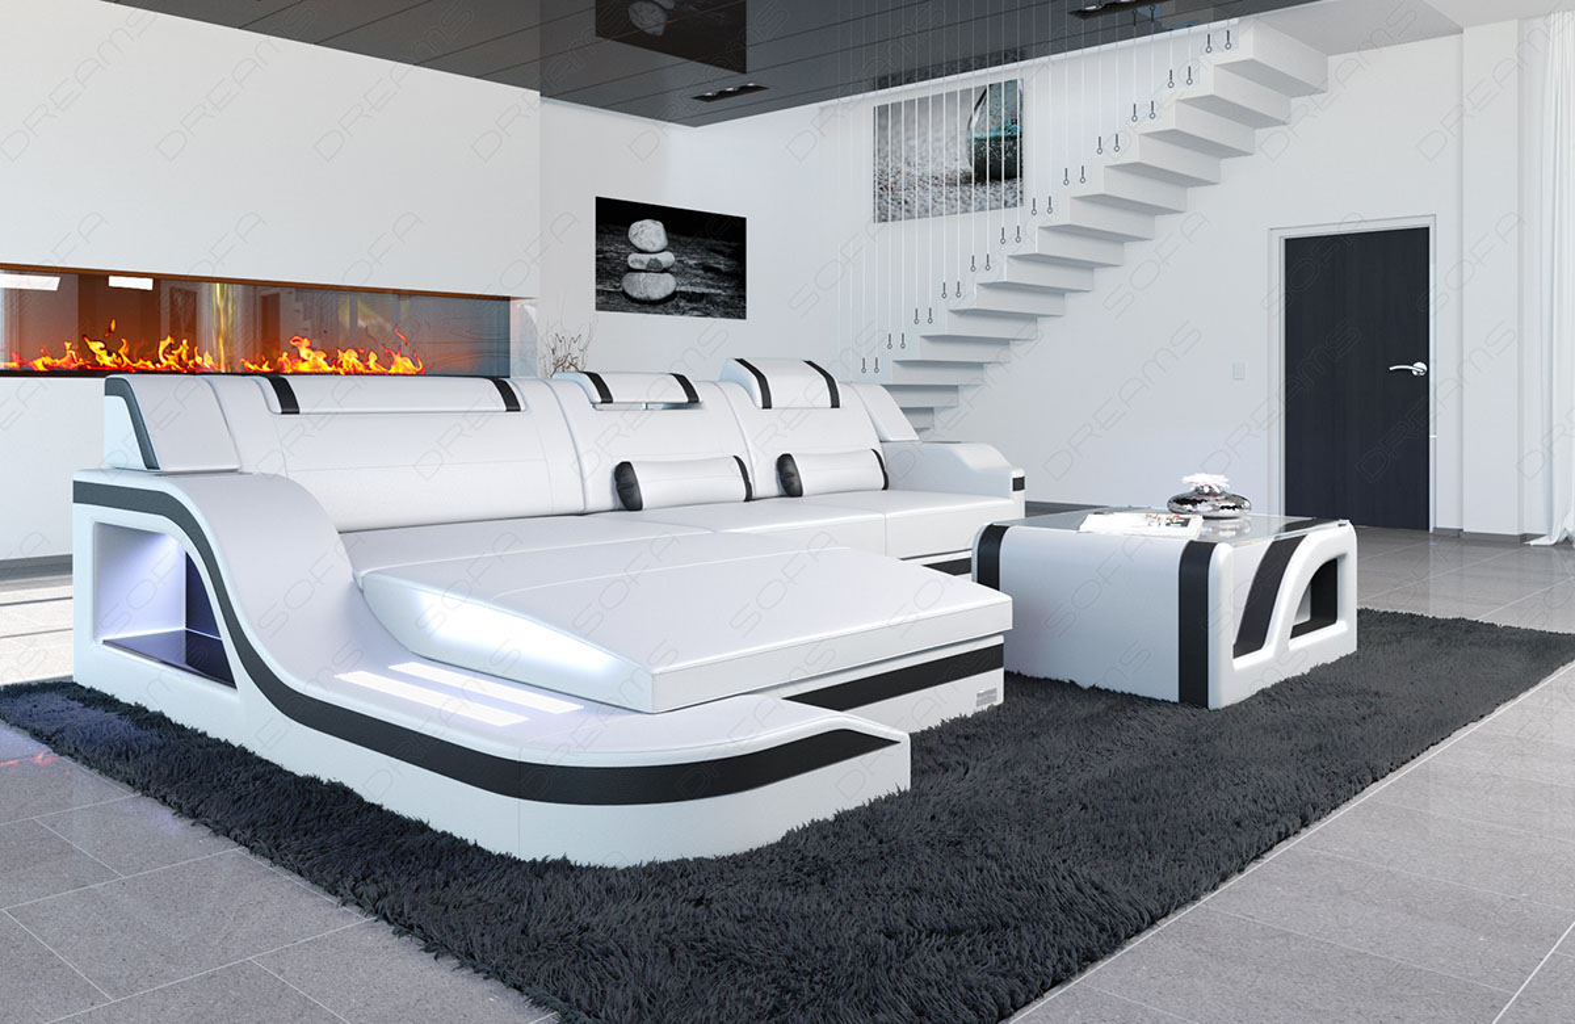 ledersofa luxus palermo l form led designersofa eckcouch bigsofa weiss schwarz ebay